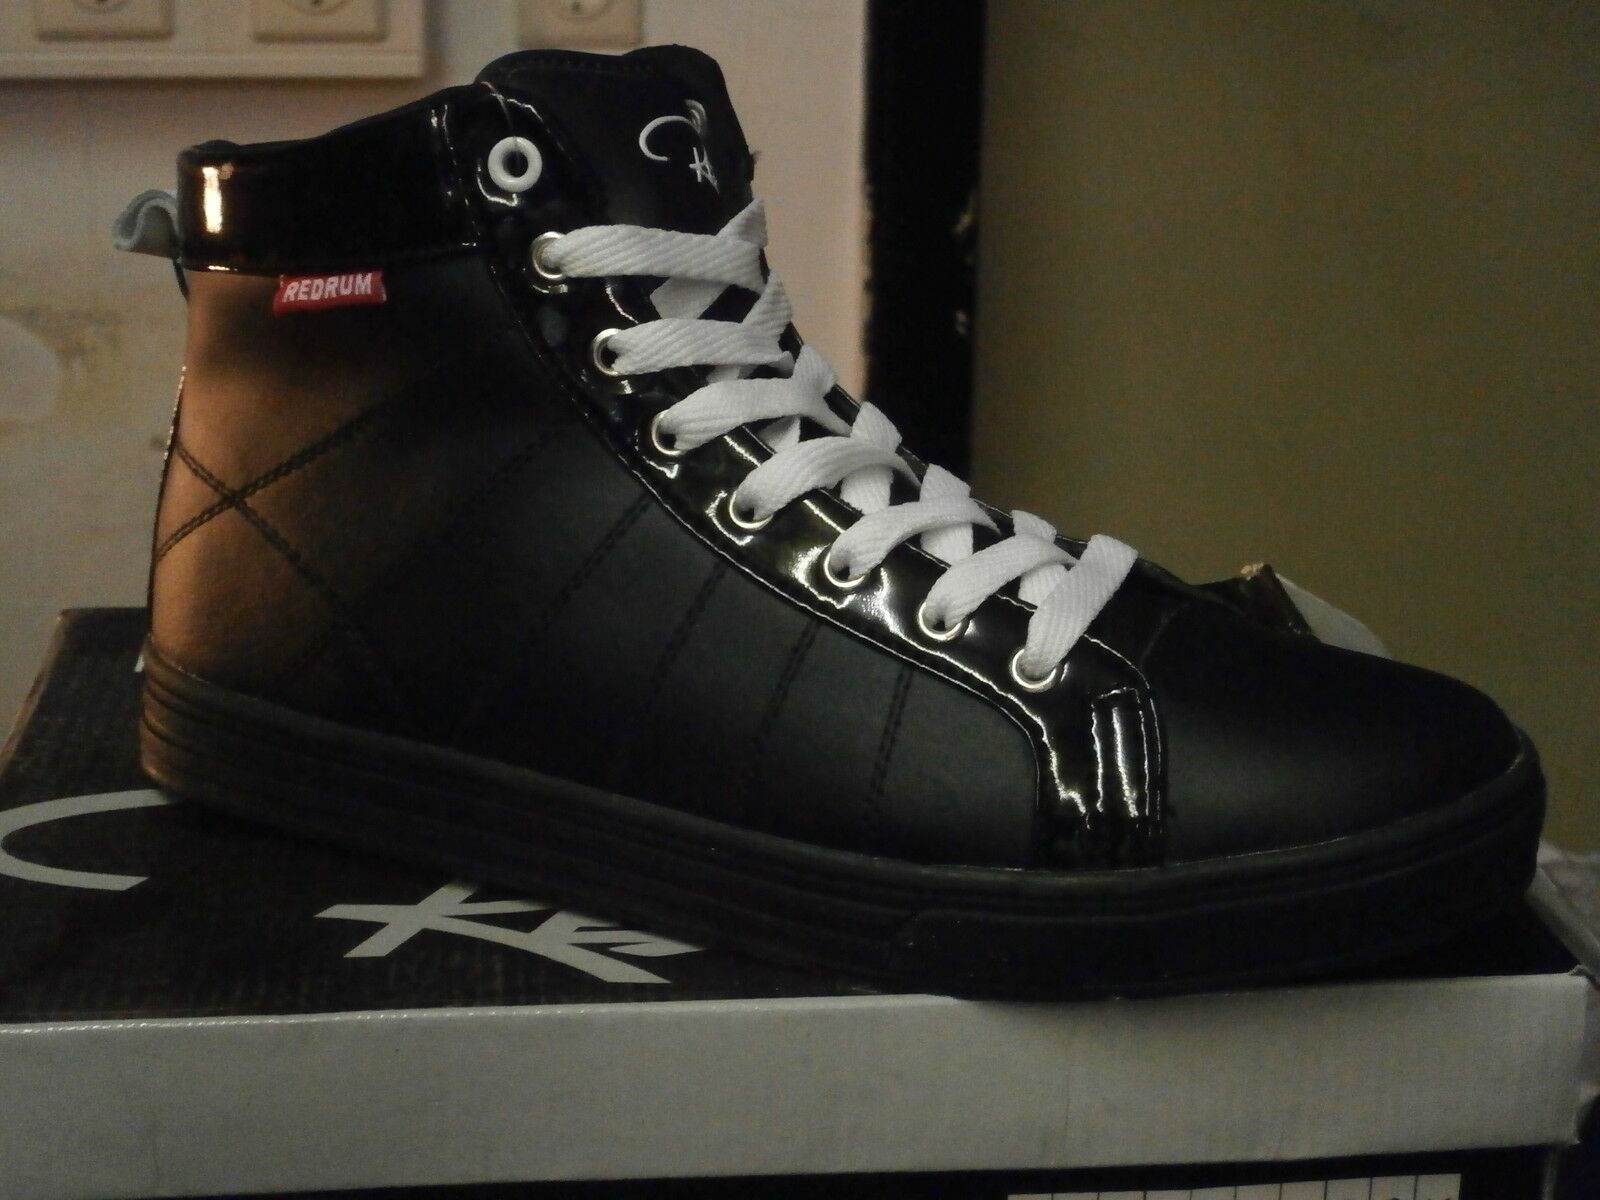 Señores turnshuhe/Shoes & Zapatillas, Redrum US Navy Boot Zapatillas style High